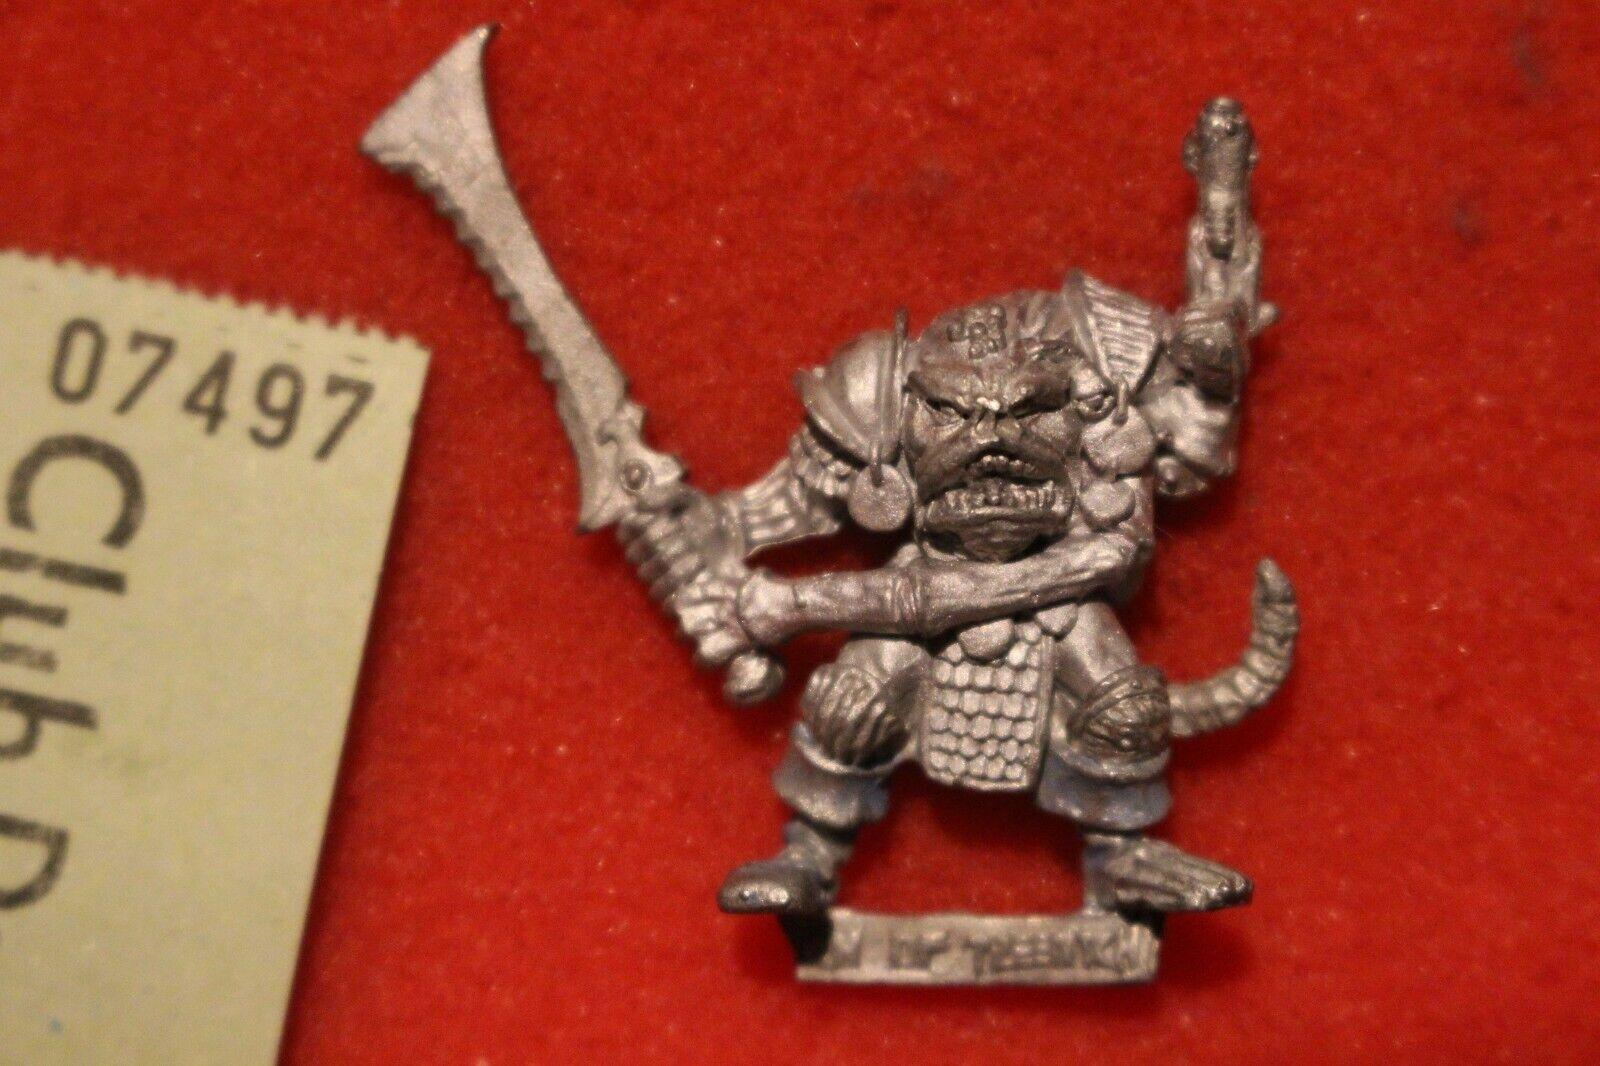 Games Workshop Warhammer Chaos Champion of Tzeentch Citadel Metal Pink Horror